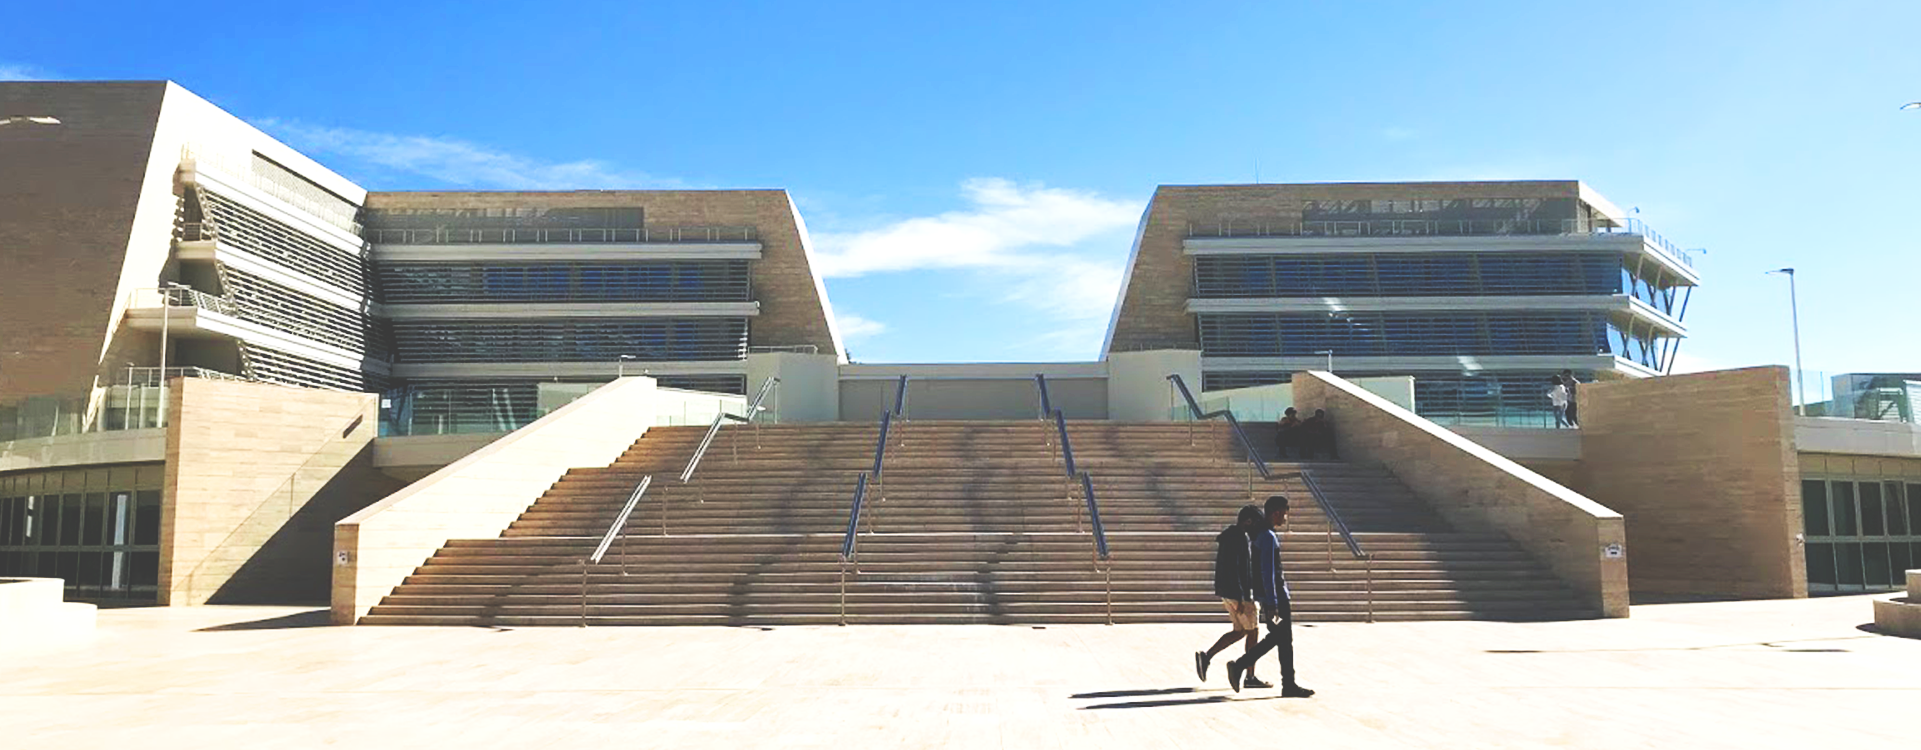 Tor Vergata University of Rome